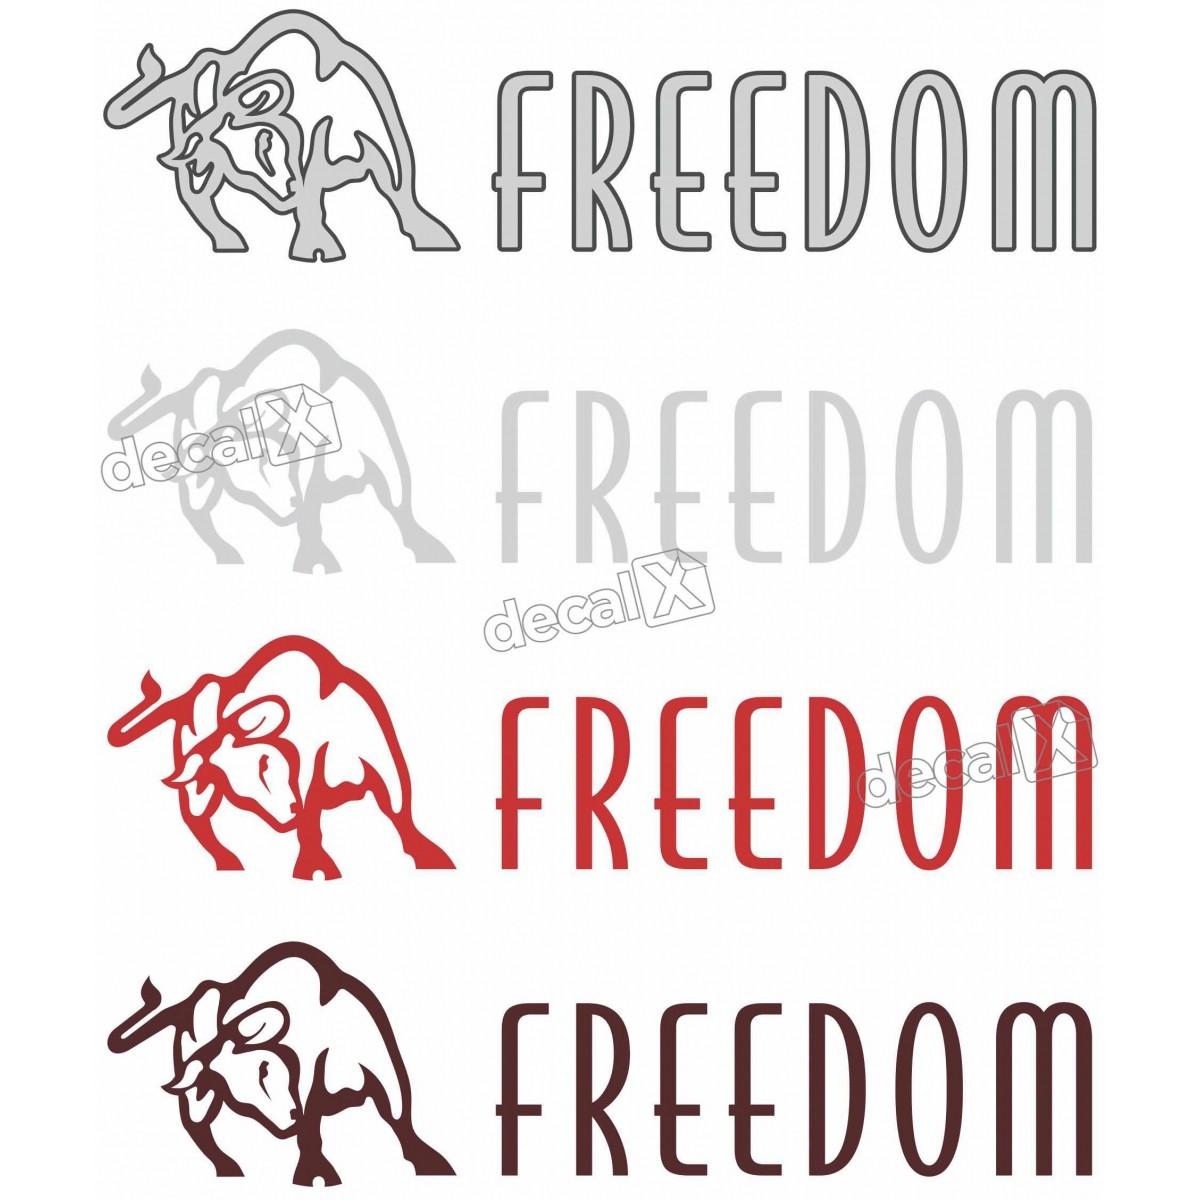 Kit Adesivo Emblema Porta Fiat Toro Freedom Toro02